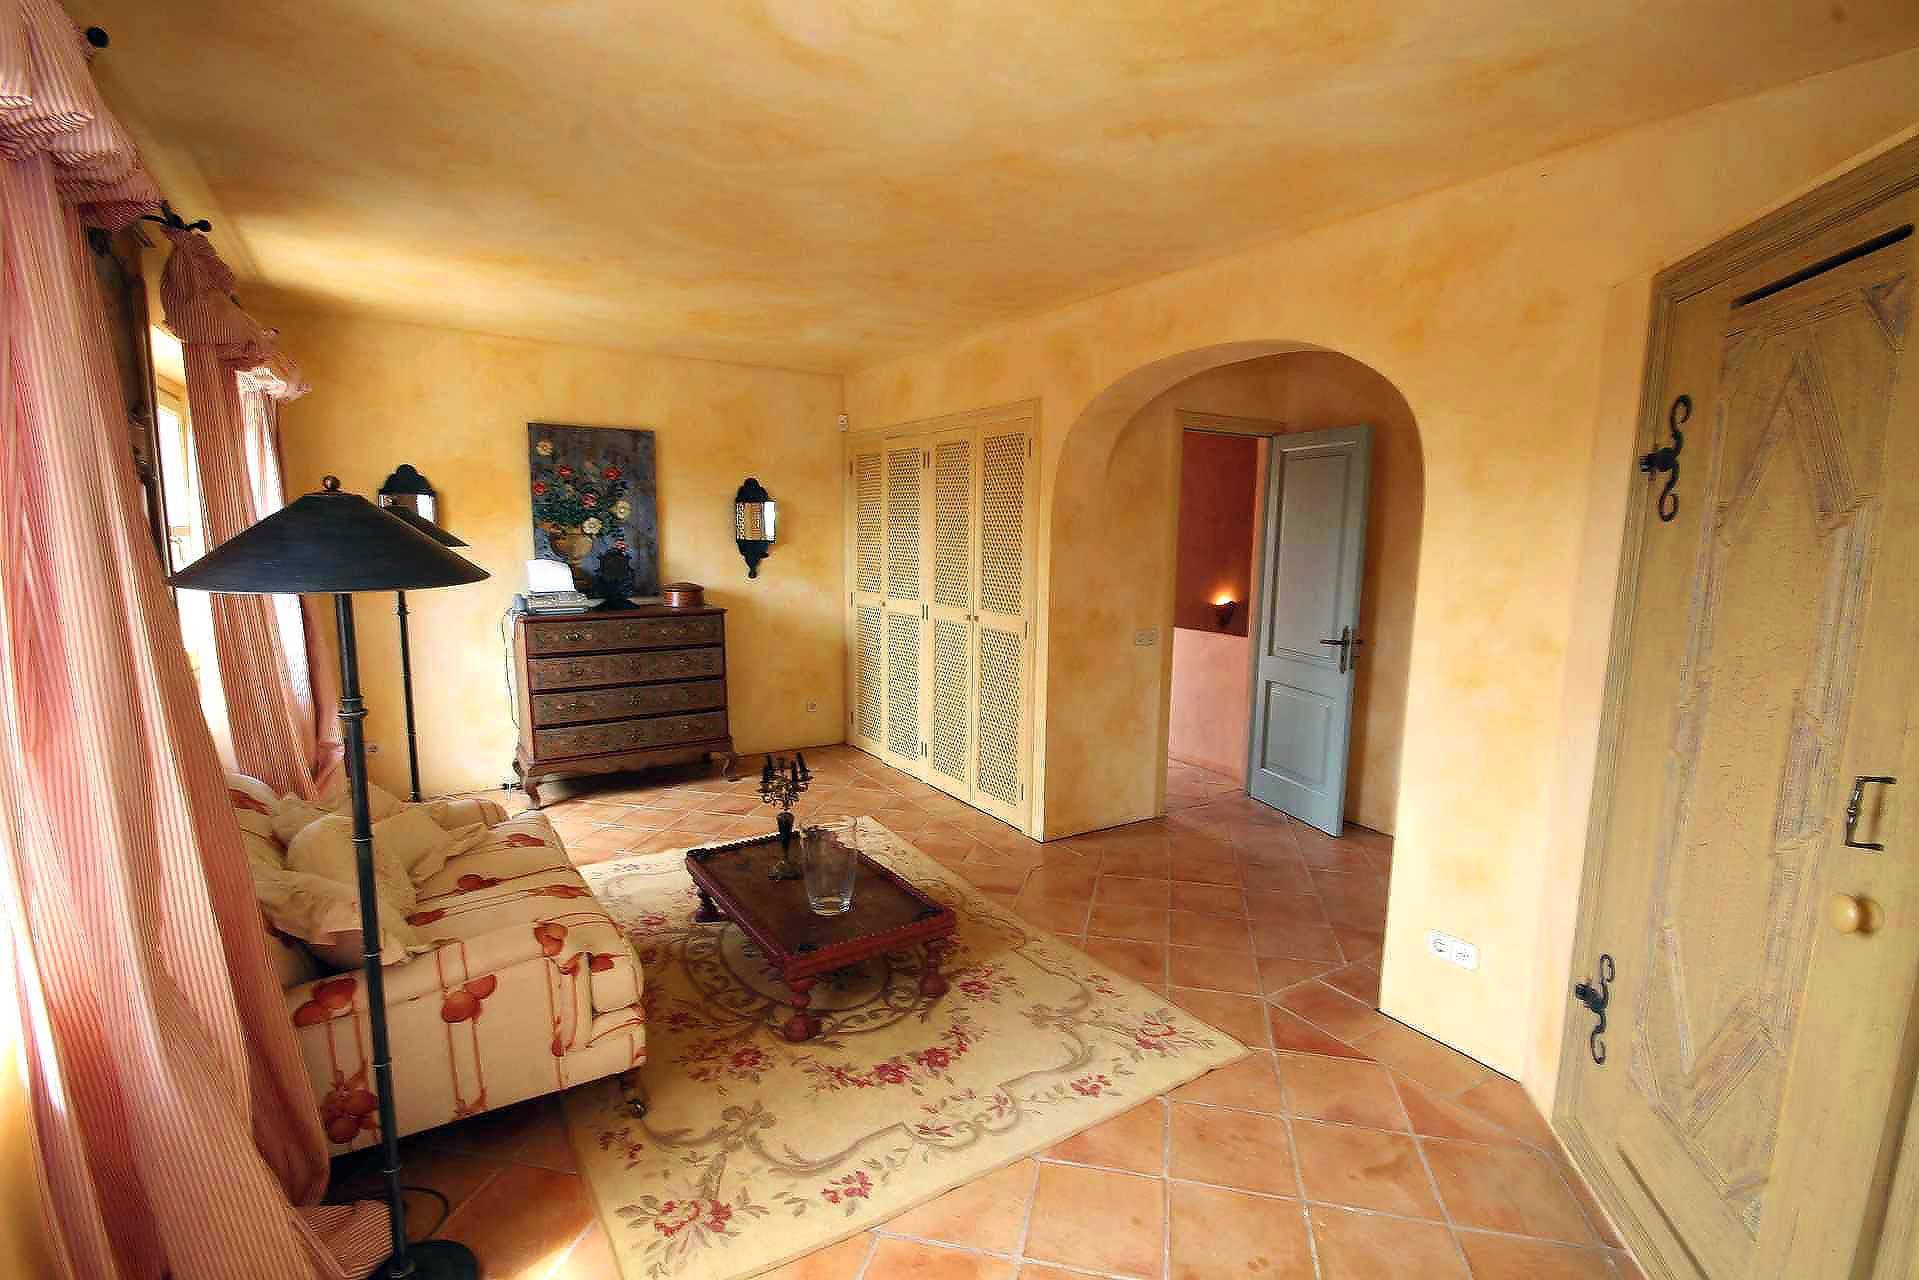 01-98 Extravagantes Ferienhaus Mallorca Osten Bild 37